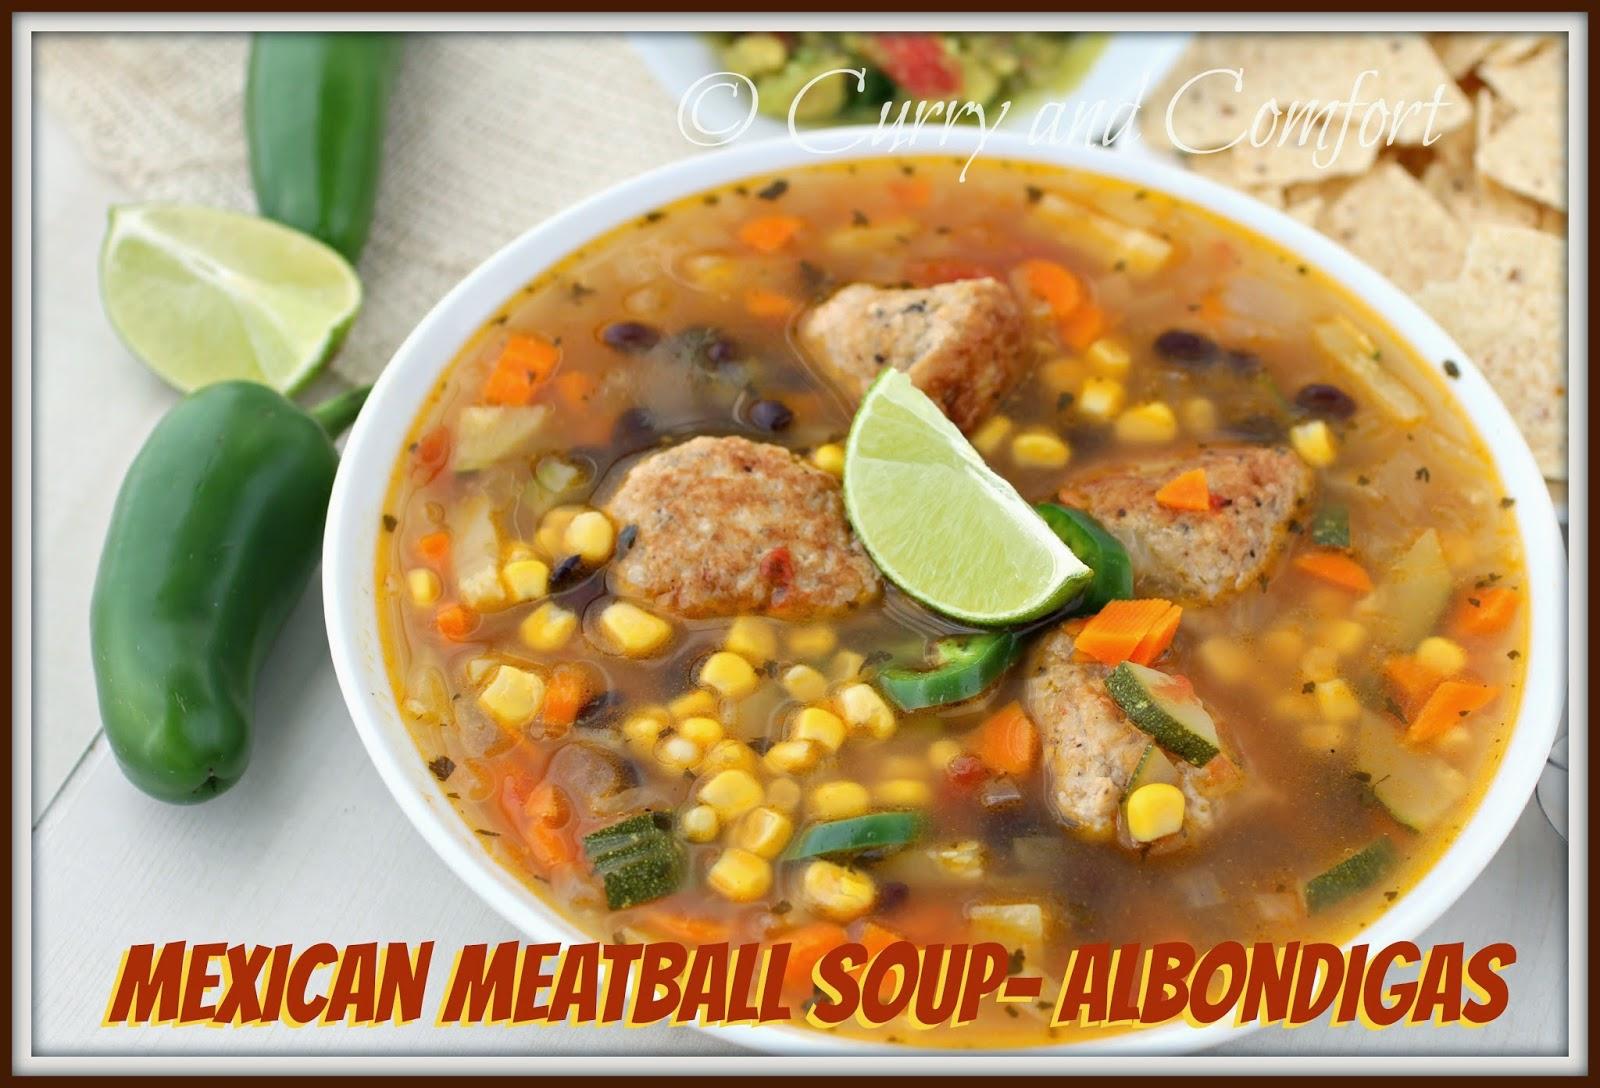 Kitchen Simmer: Mexican Meatball Soup (Albondigas)- Throwback Thursday